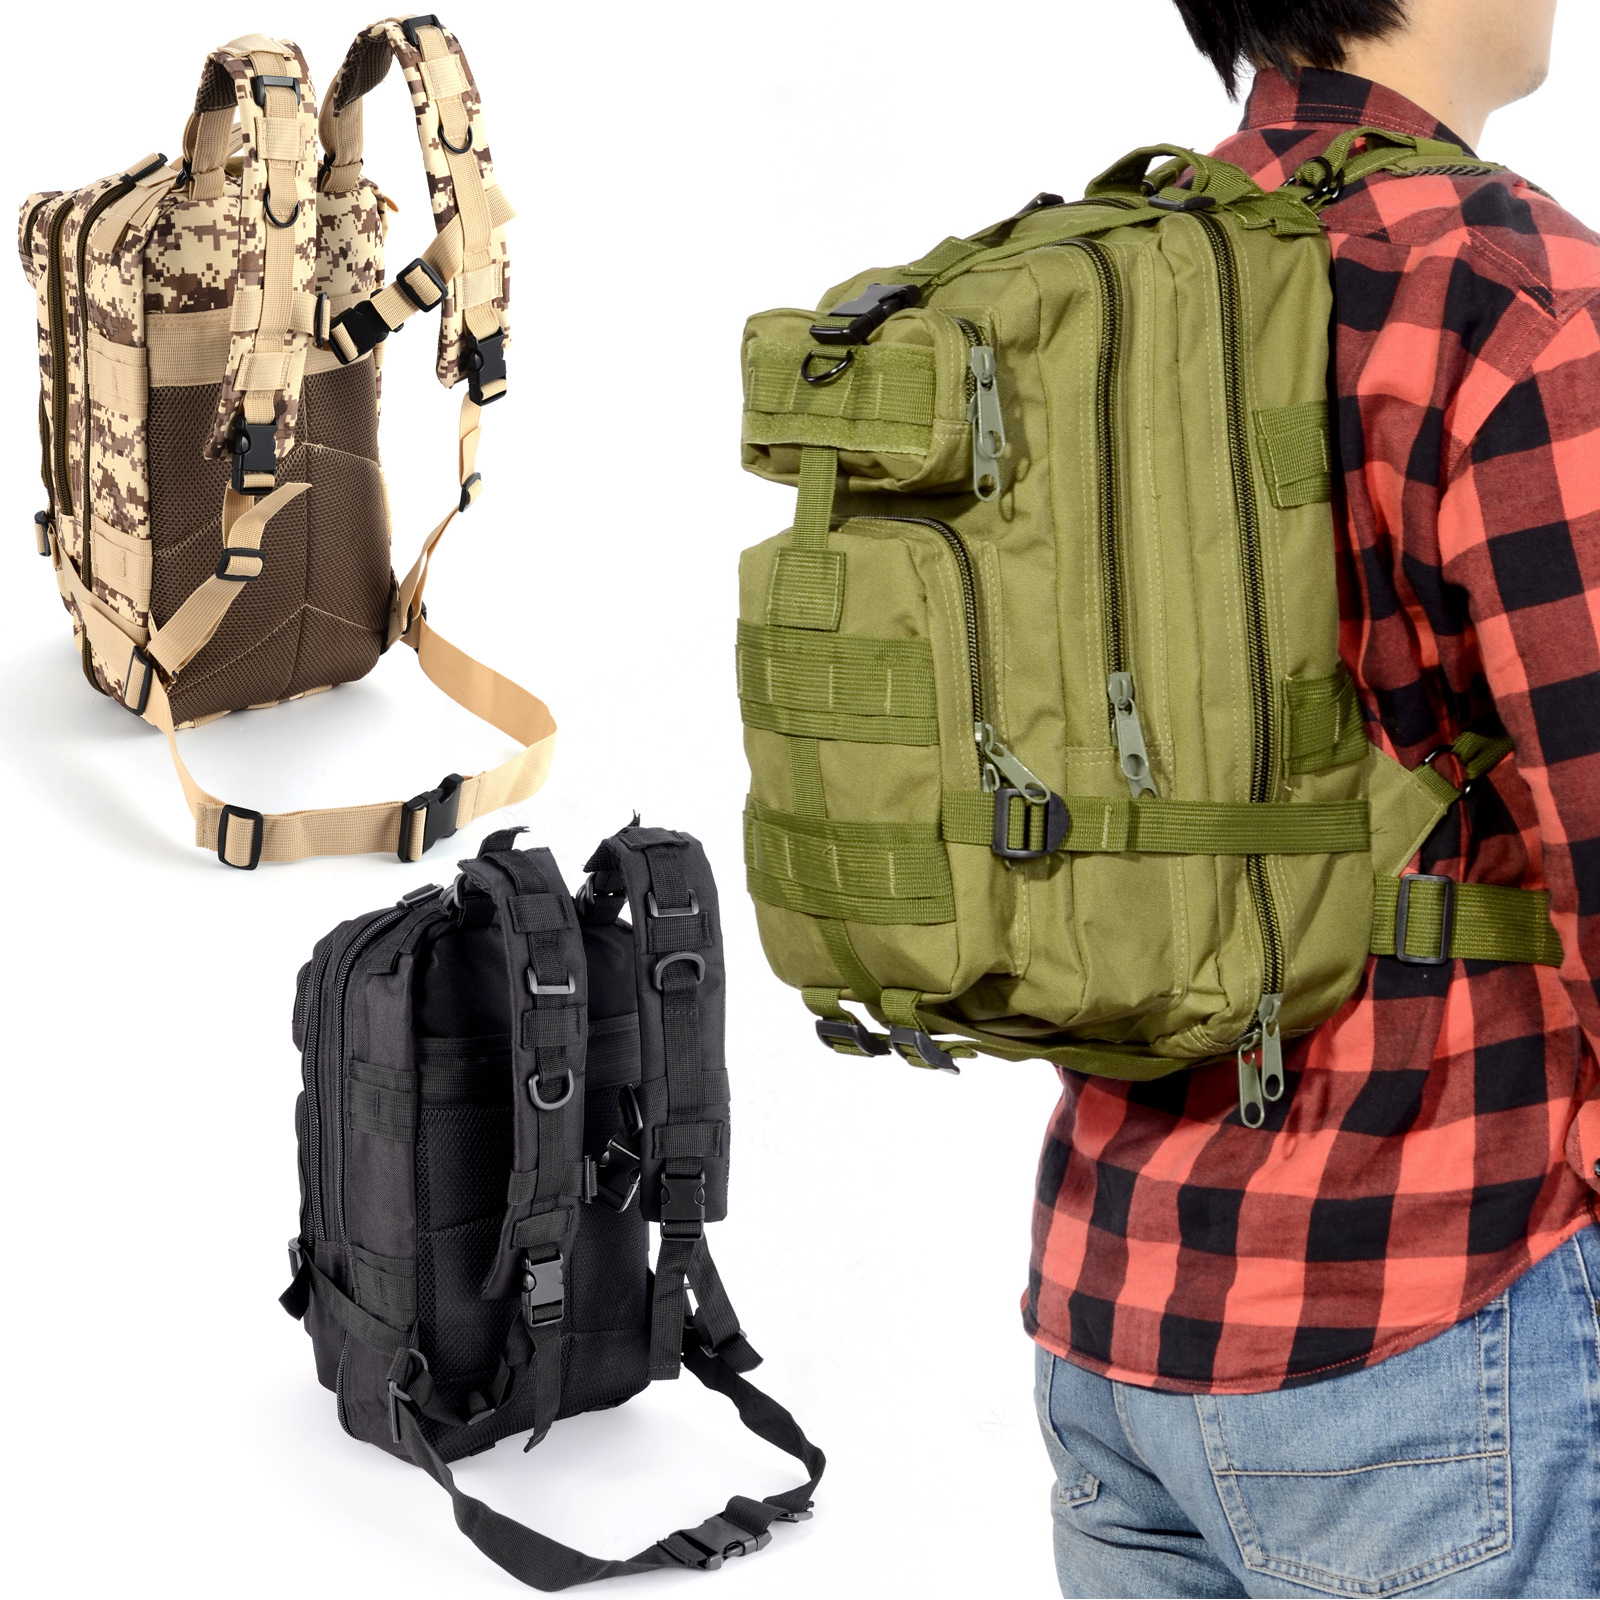 30l sac a dos bandouli re tactique militaire outdoor camping randonn e etanche ebay. Black Bedroom Furniture Sets. Home Design Ideas